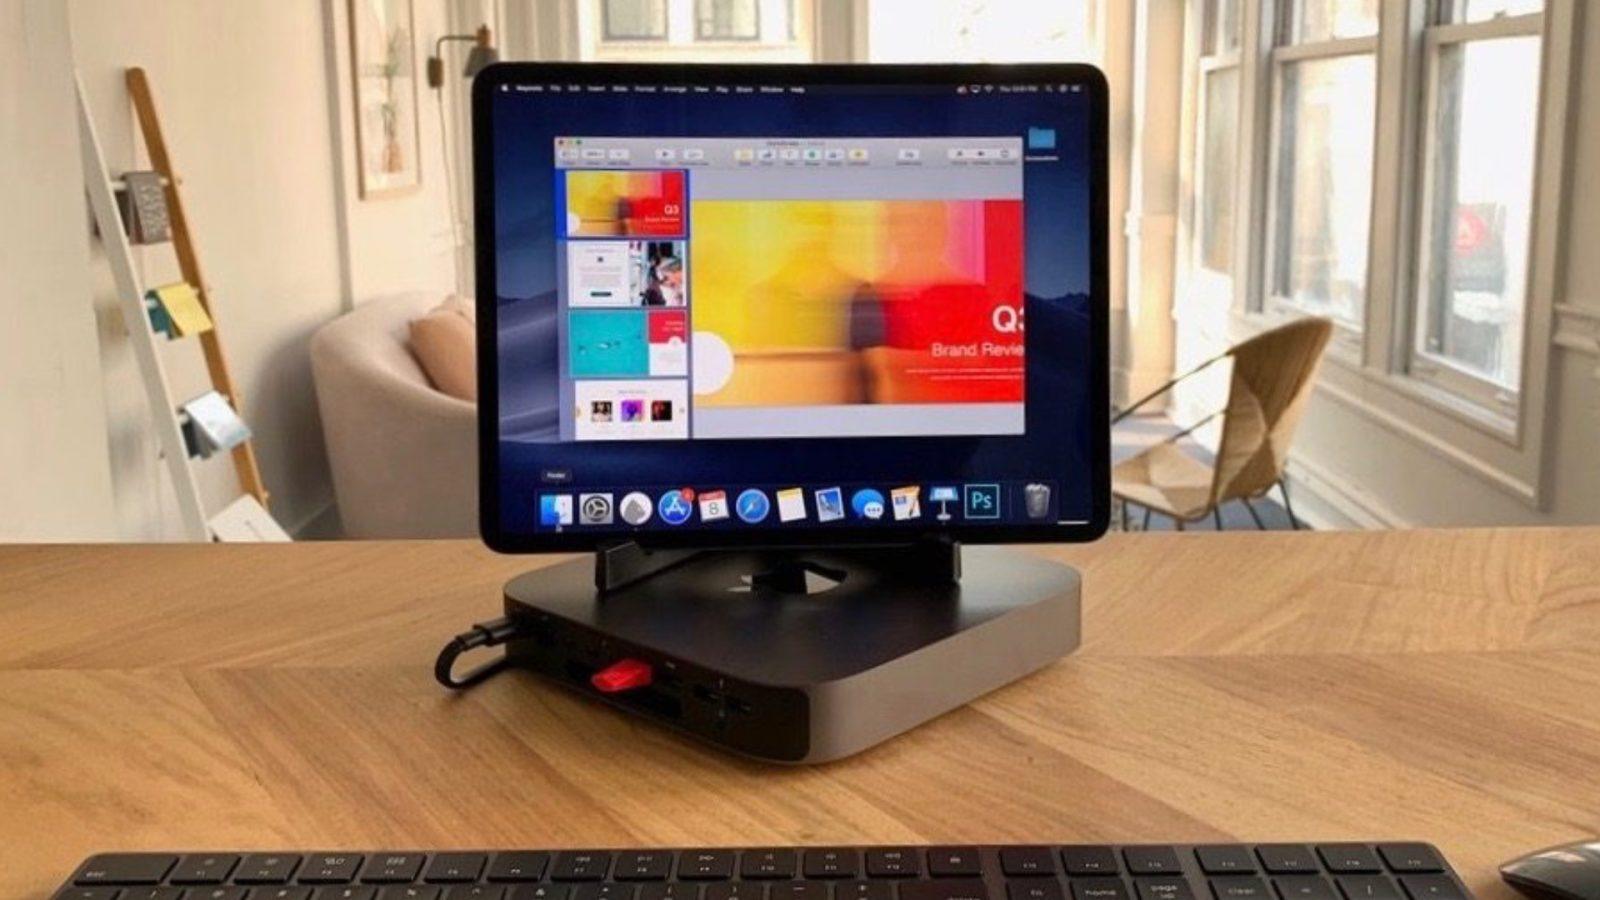 Ipad Secondary Mac Display - 9to5mac